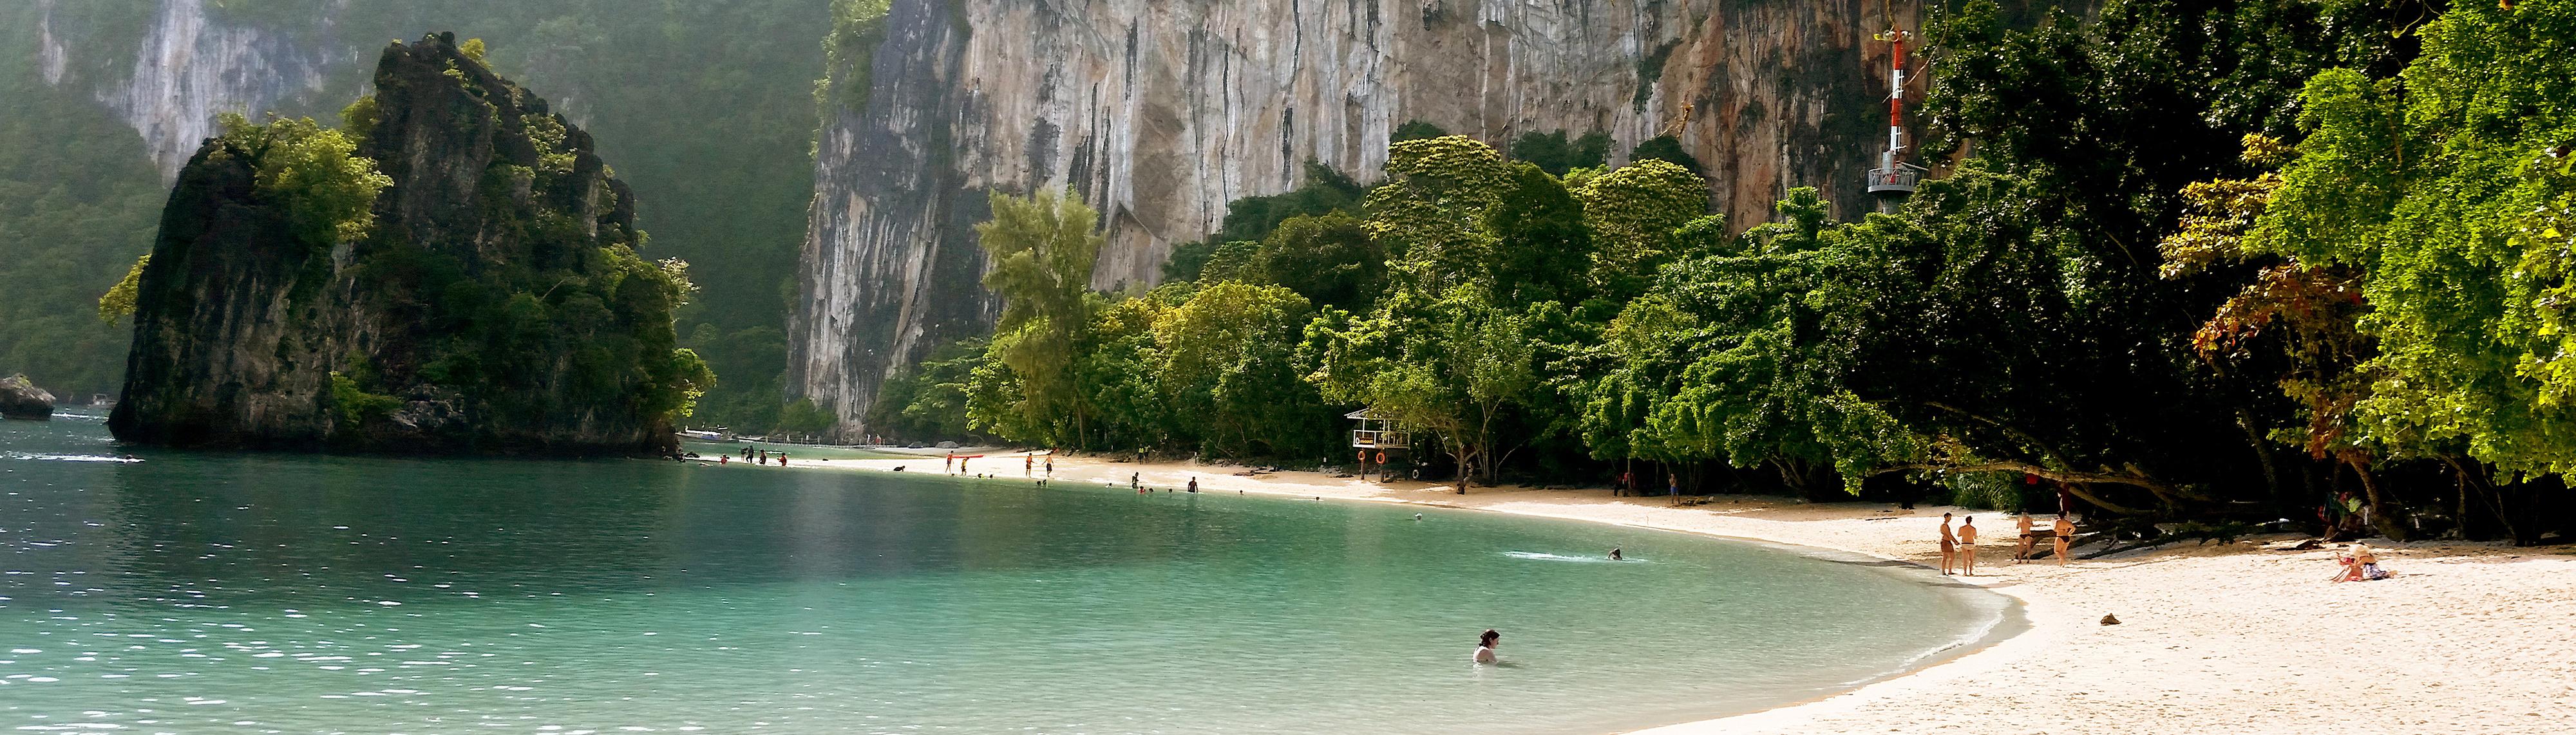 Vingresor thailand